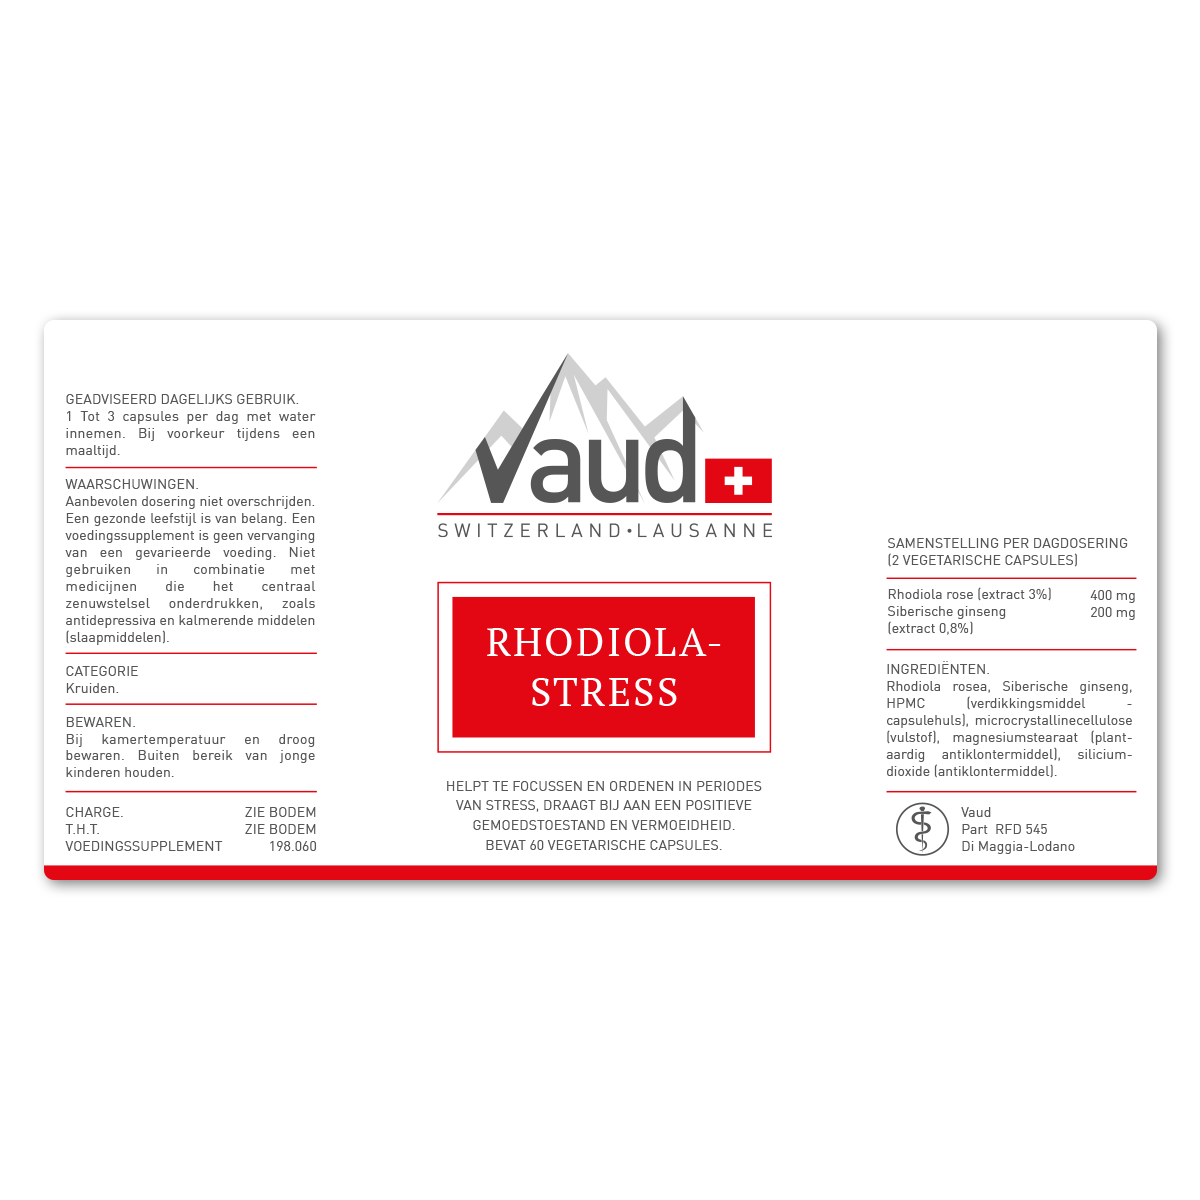 rhodiola-stress tijdens stressvolle situaties